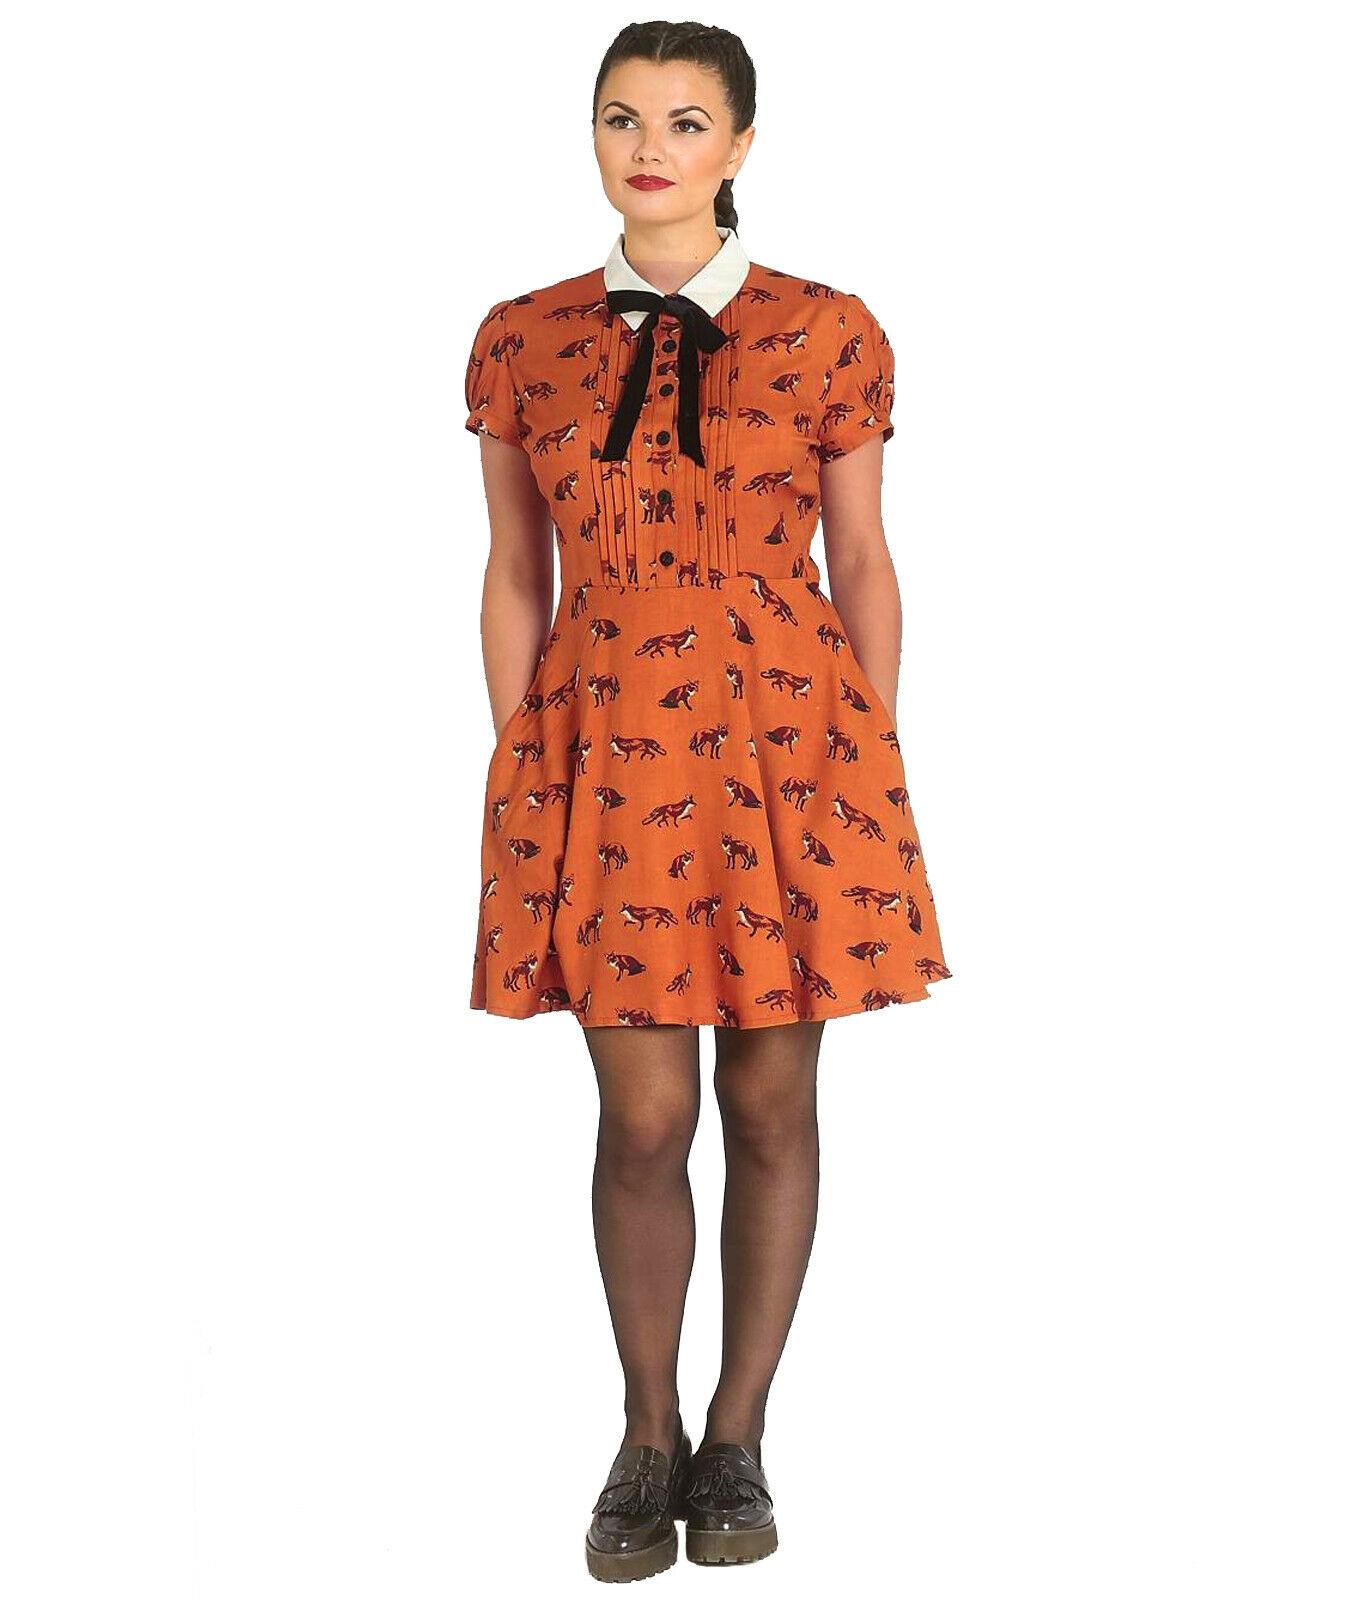 Hell-Bunny-40s-50s-Brown-Mini-Dress-Pin-Up-VIXEY-Vixen-Fox-Print-All-Sizes thumbnail 7